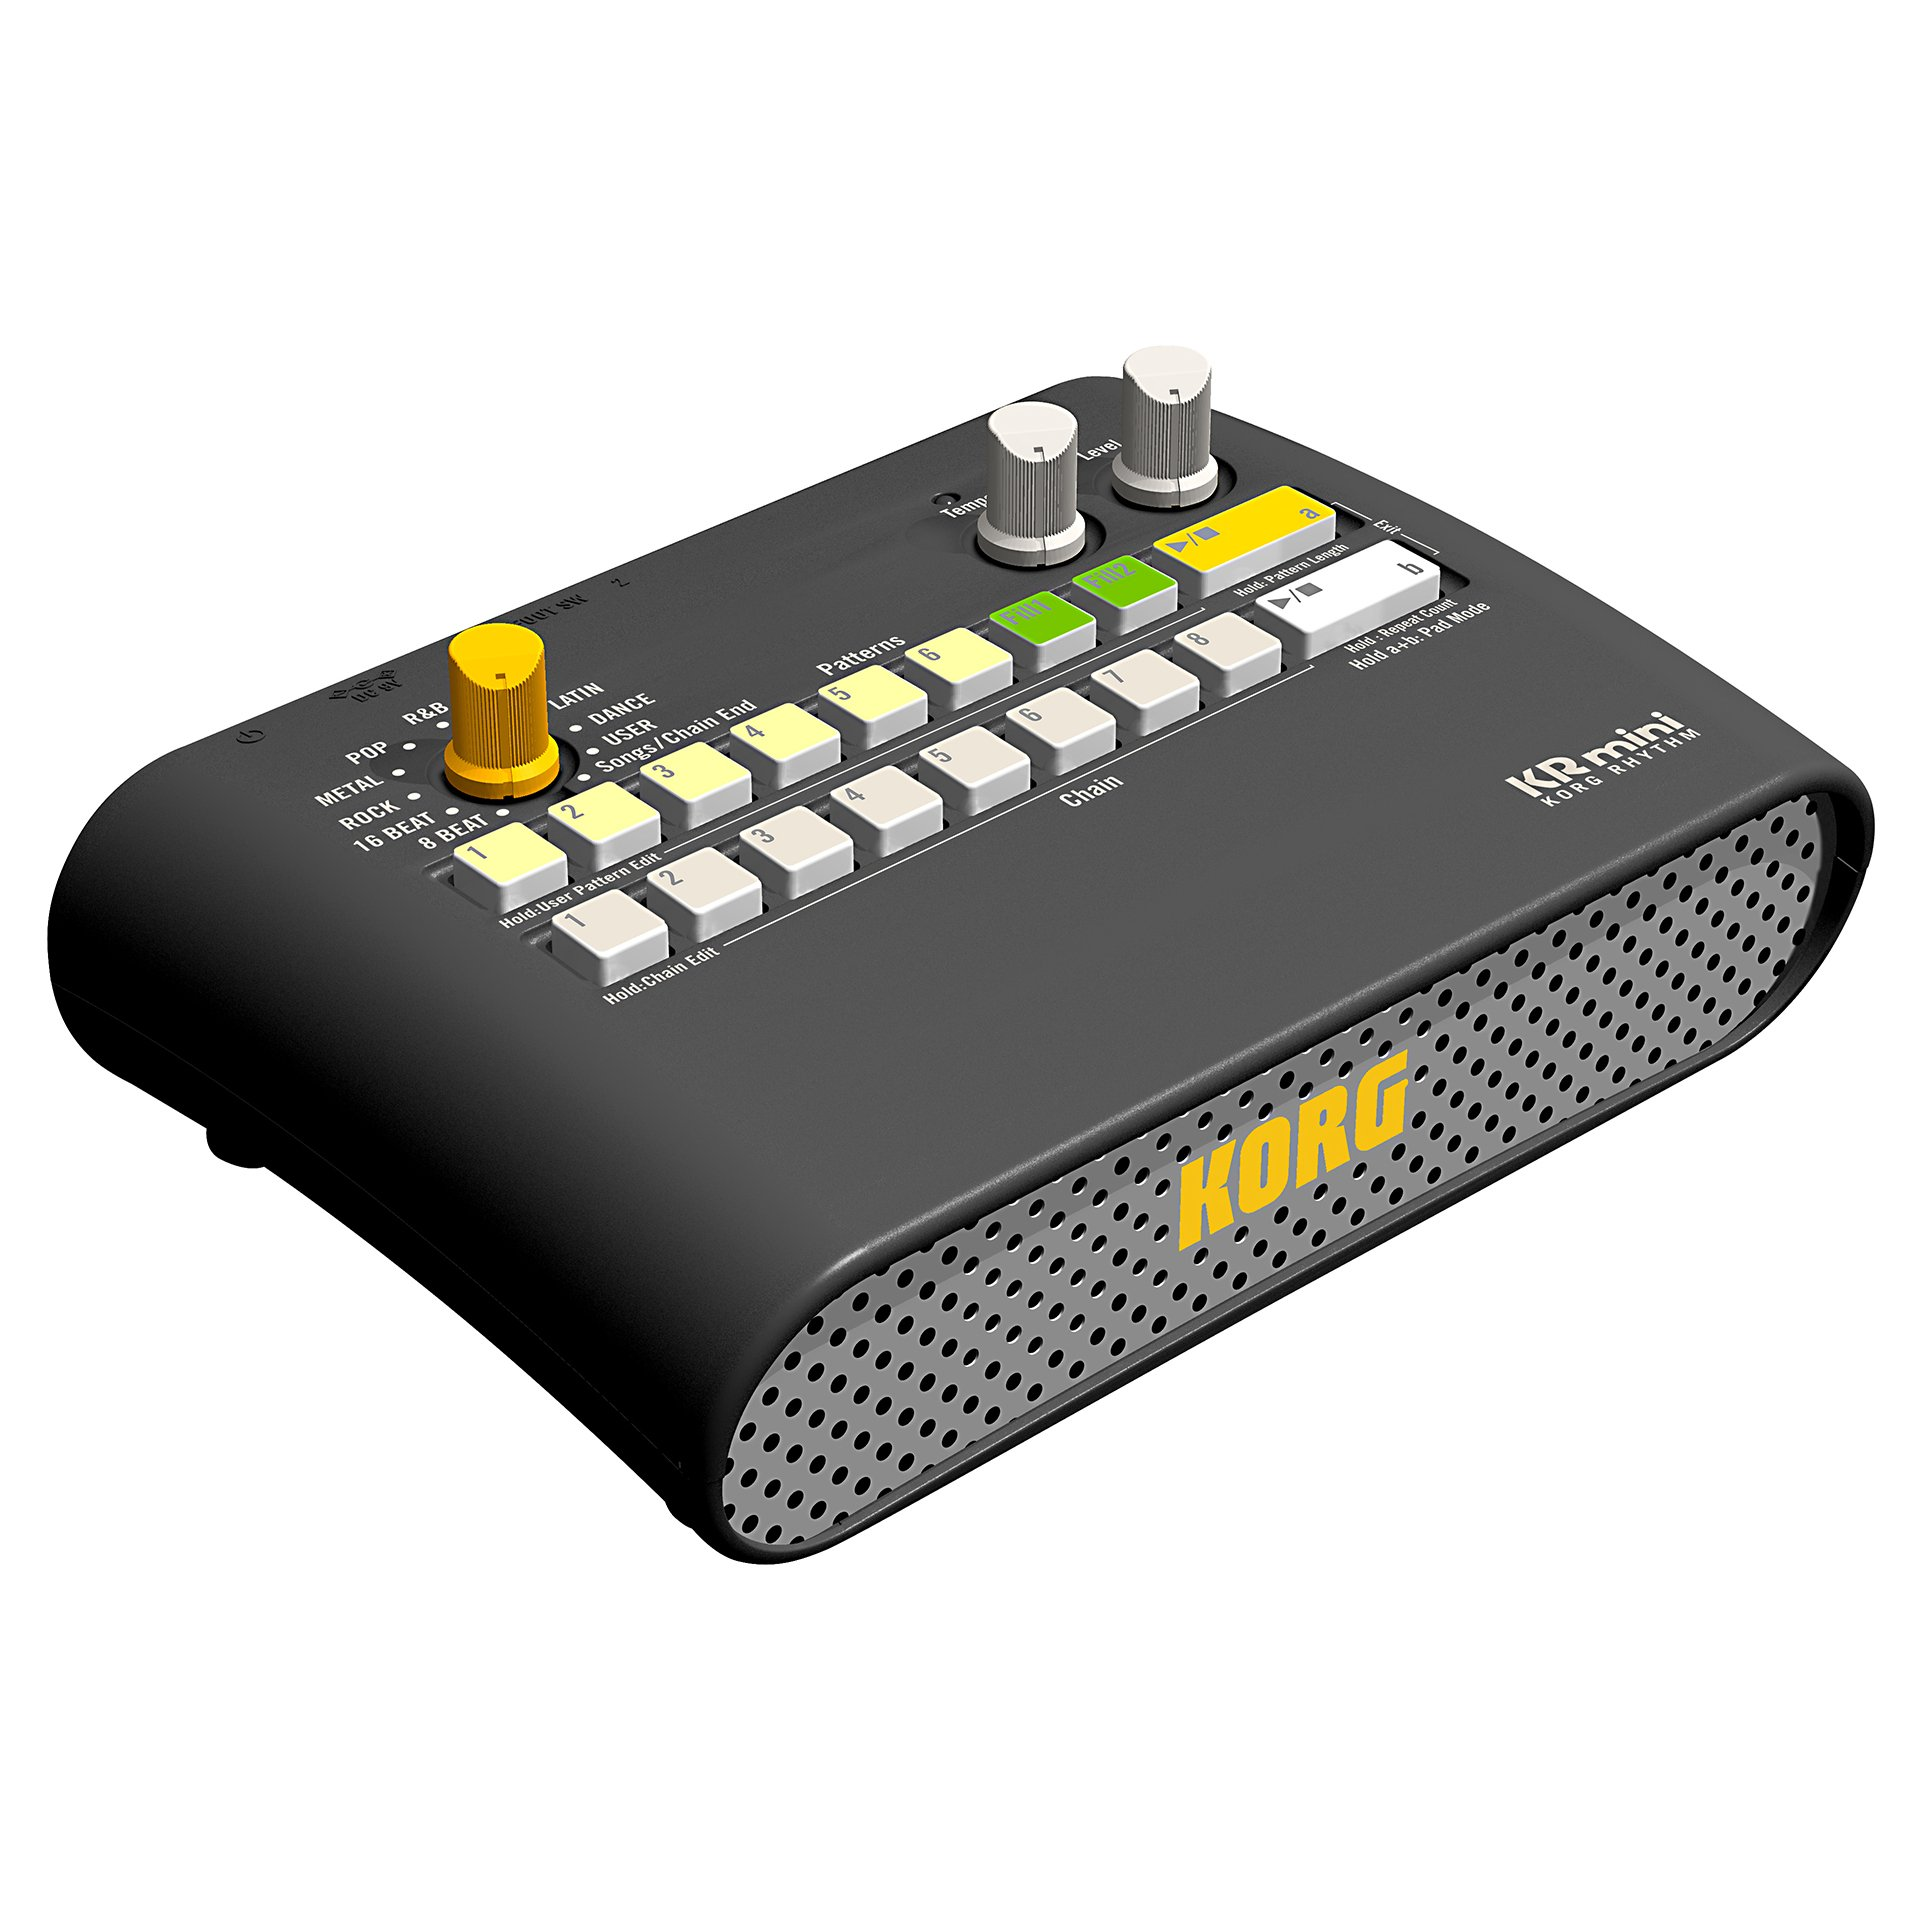 Korg Portable Keyboard, inch (KRMINI) by Korg